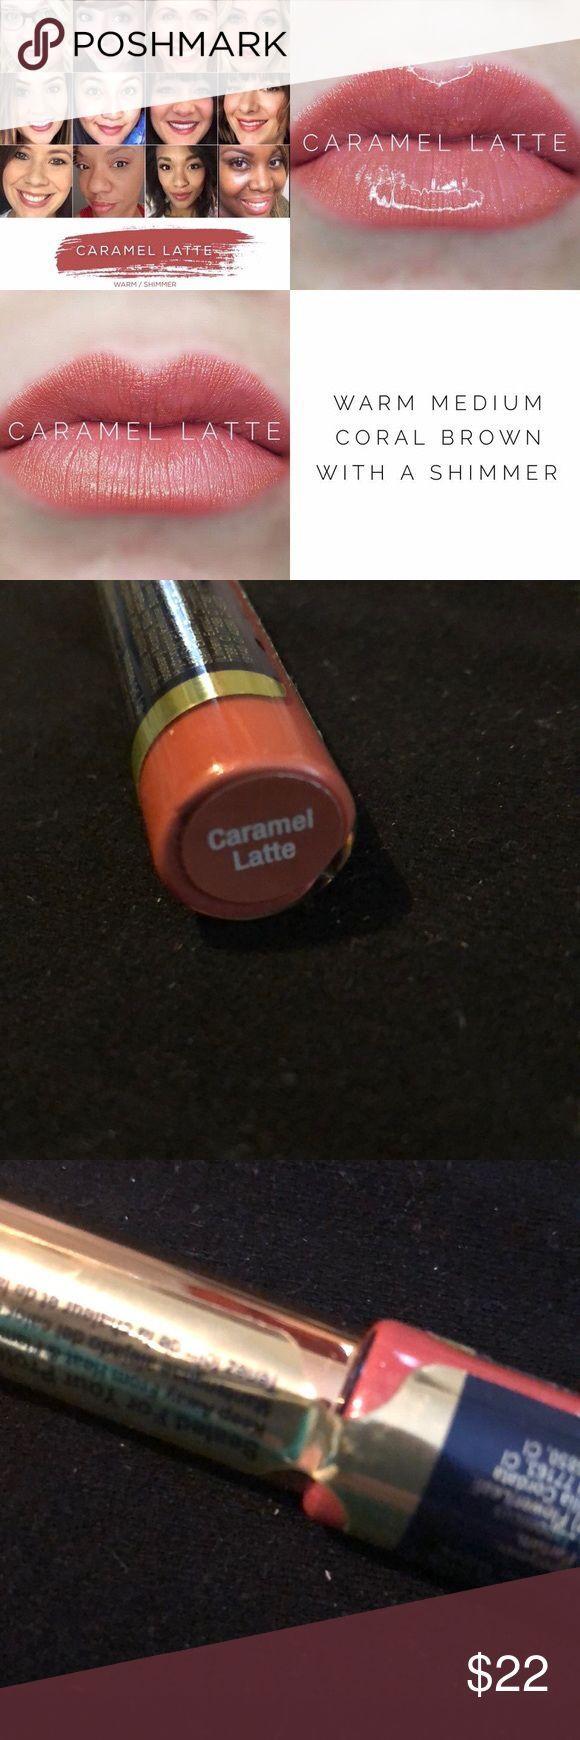 👄 Caramel Latte LipSense Farbe. Versiegeltes Produkt 👄 Caramel Latte LipSe…